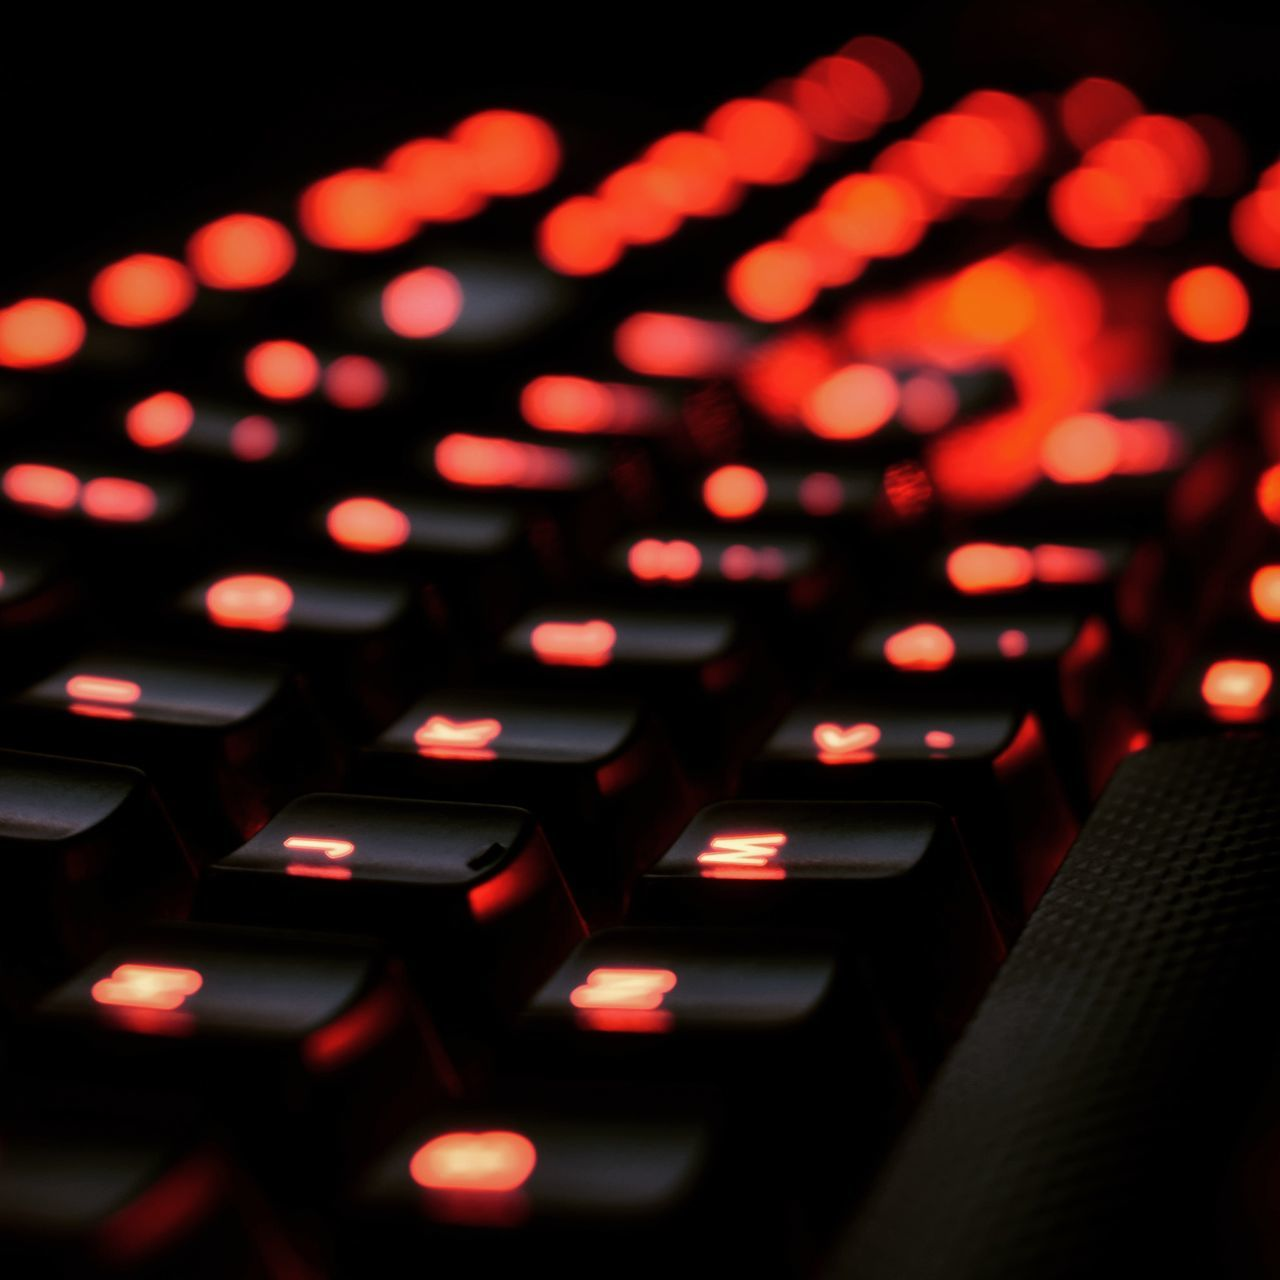 no people, indoors, technology, illuminated, close-up, night, computer keyboard, keyboard, computer key